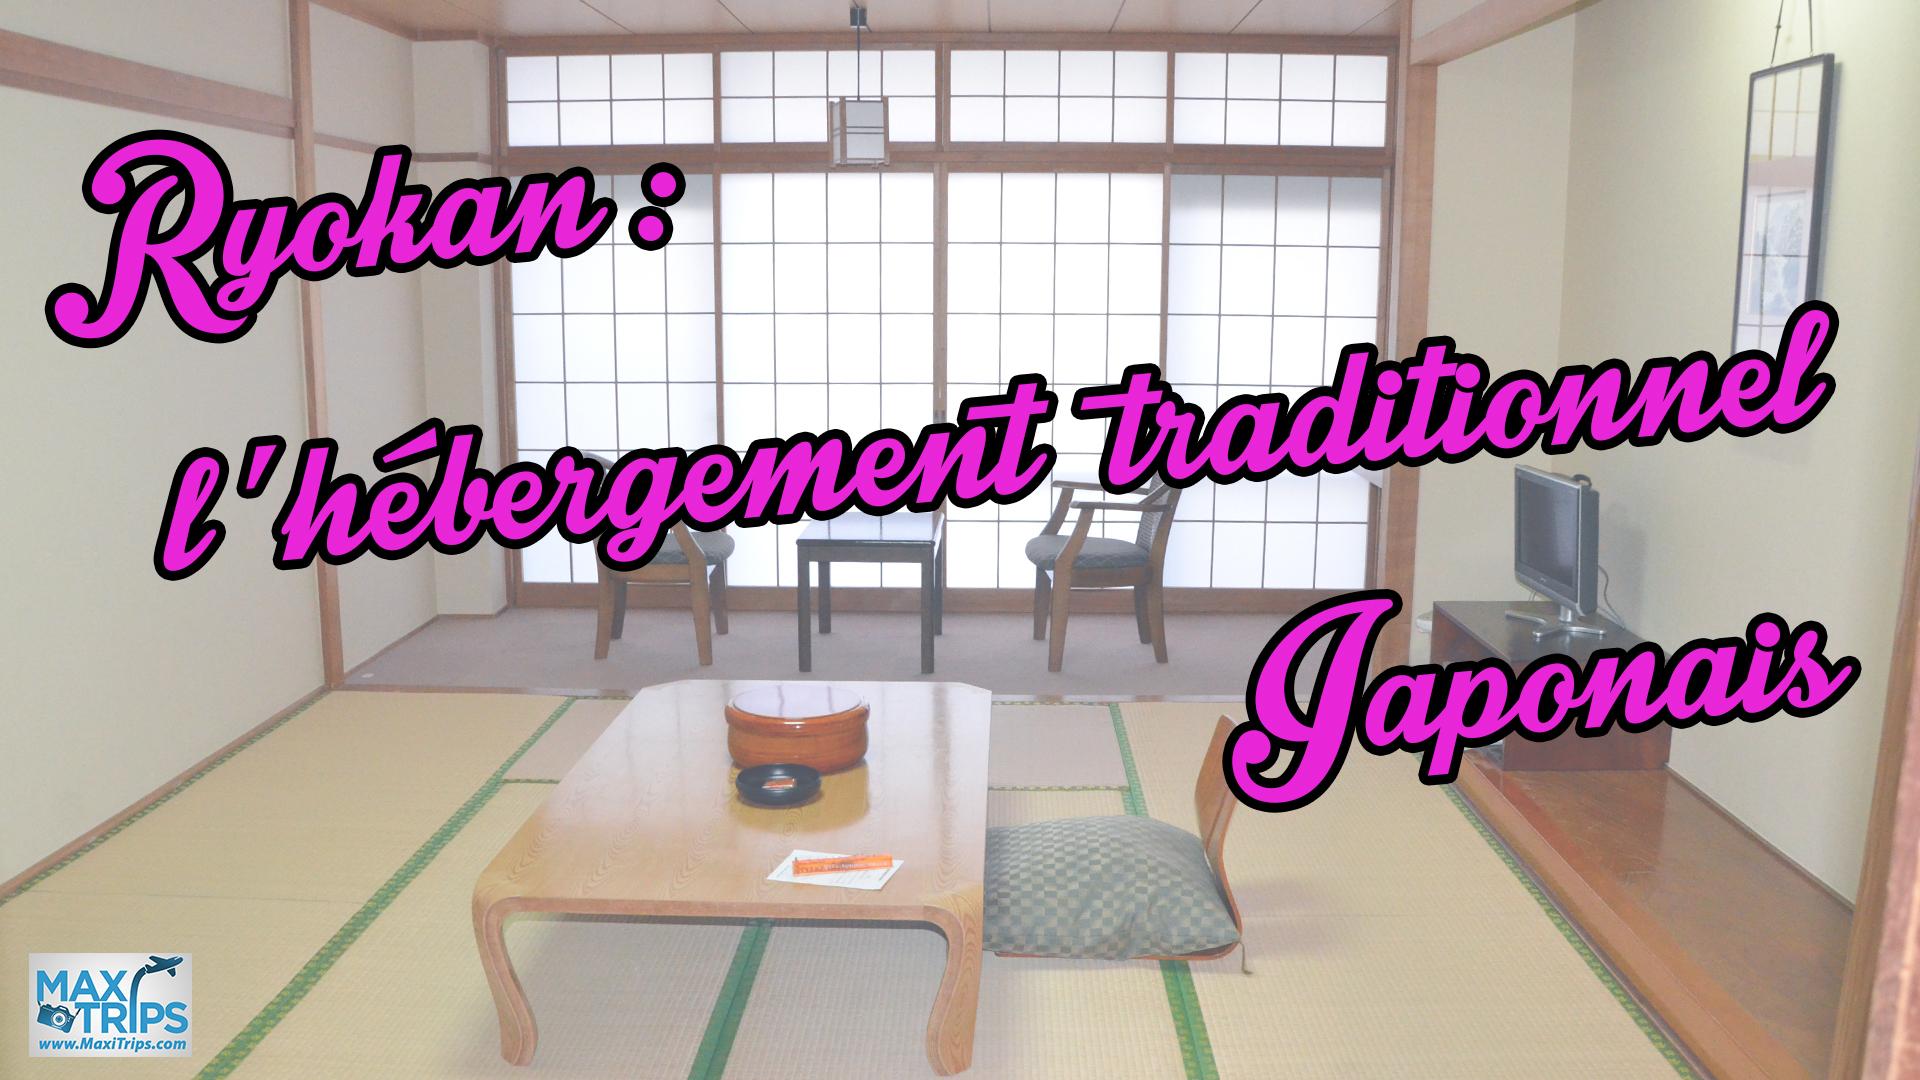 ryokan-hebergement-traditionnel-japonais-maxitrips